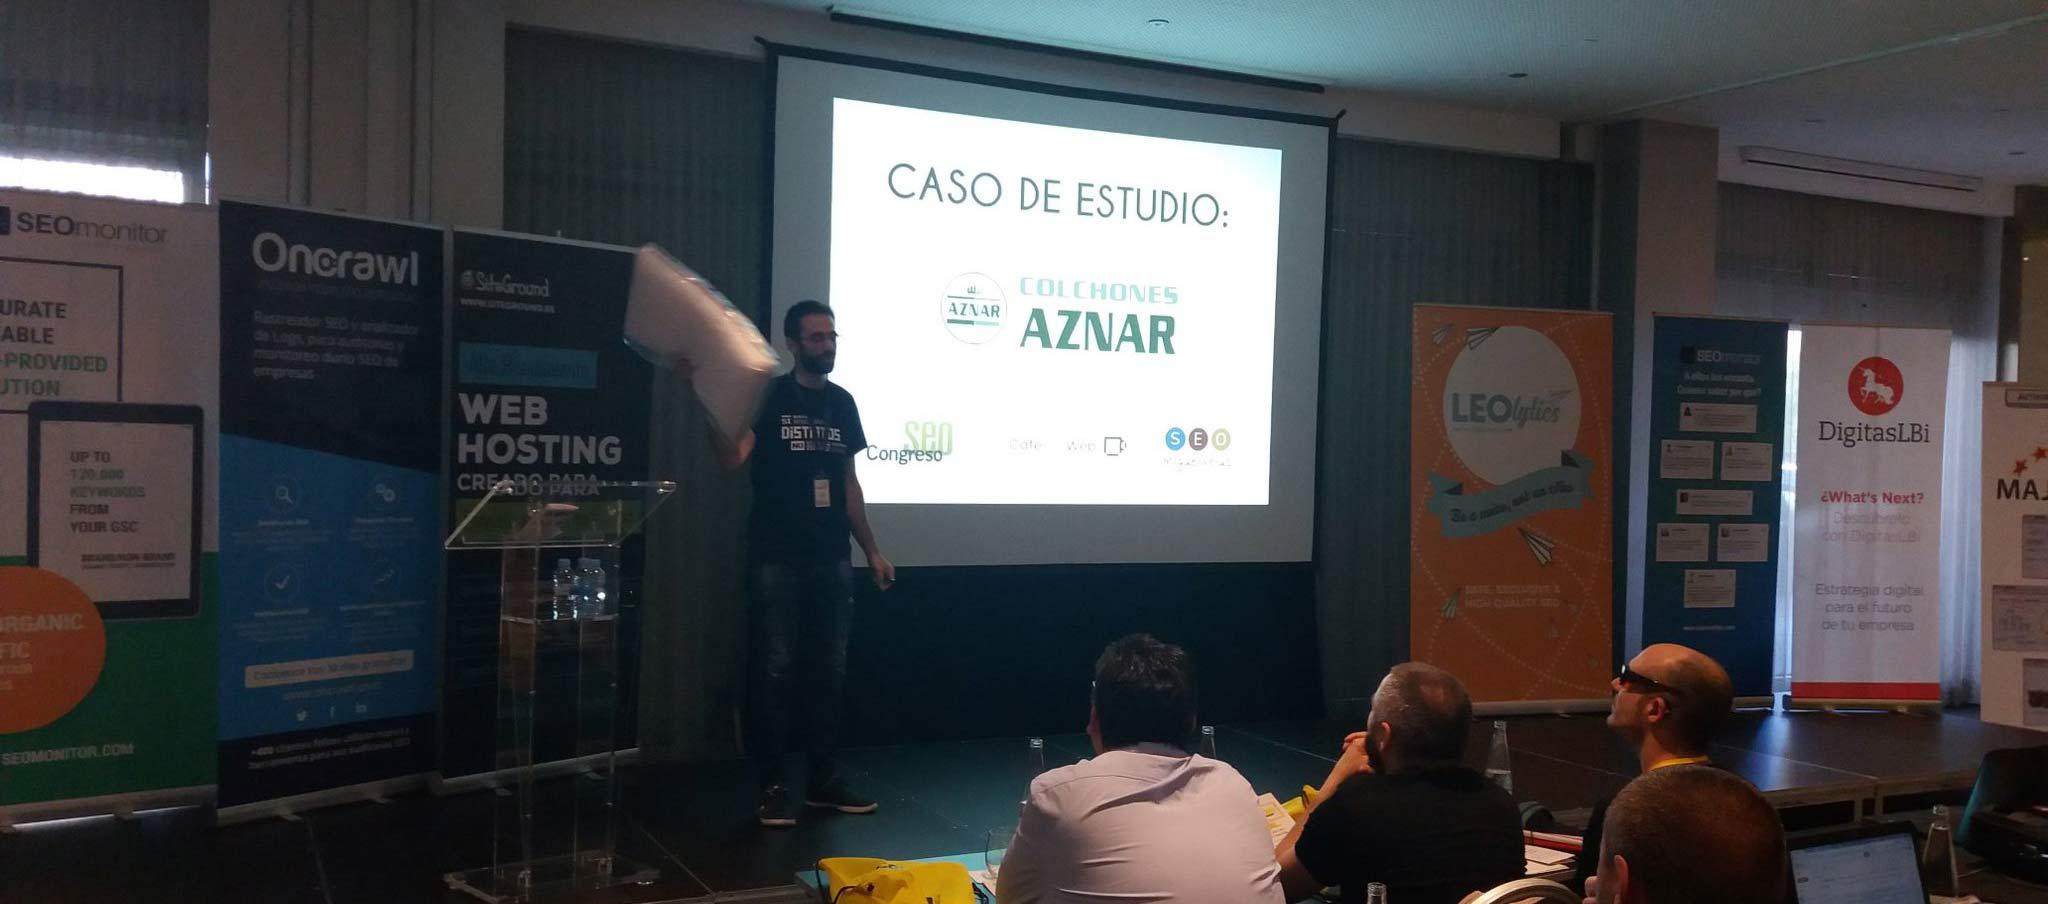 Almohada de Colchones Aznar en el seopro de Madrid